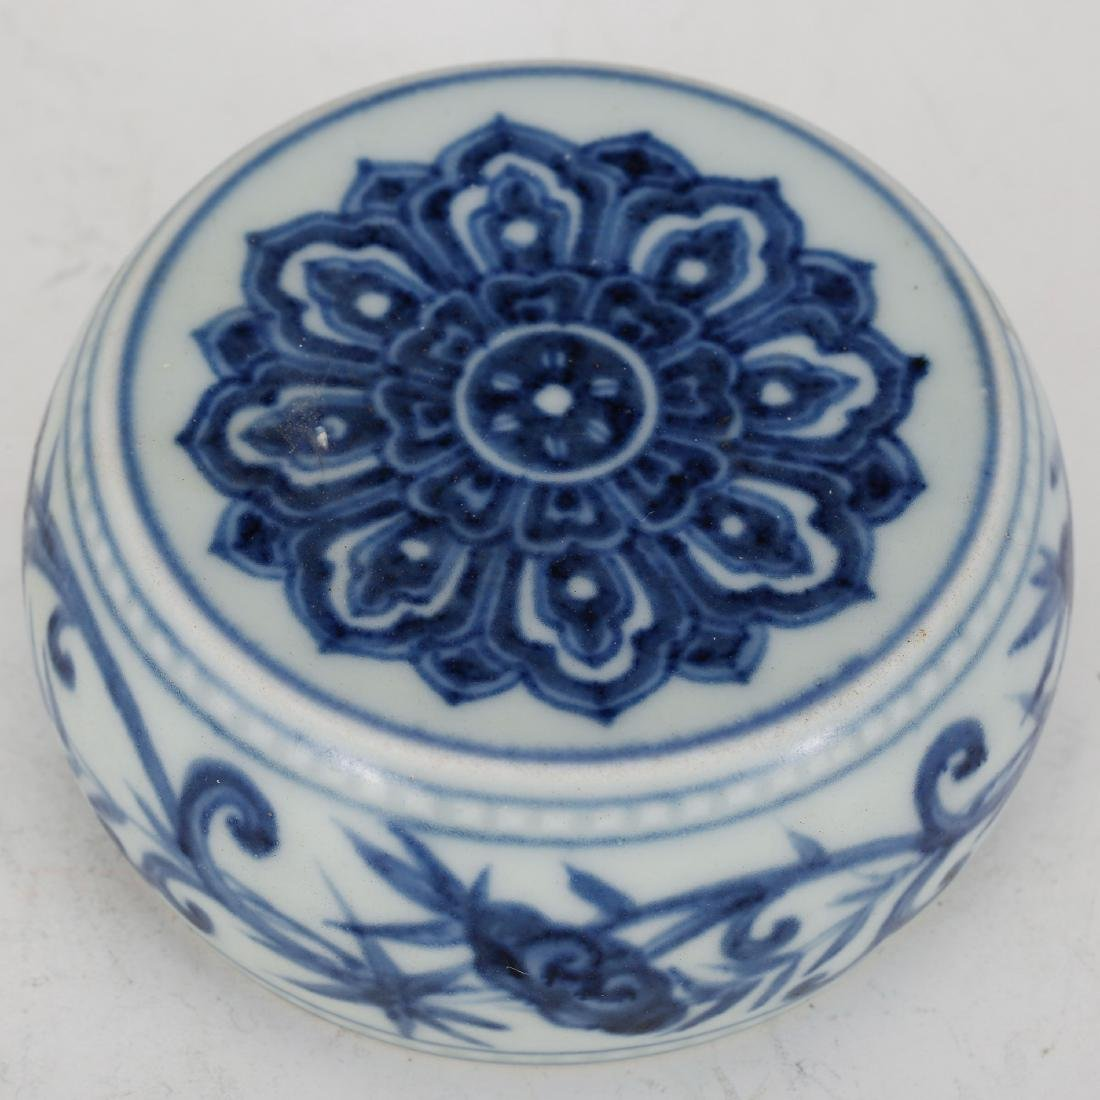 CHINESE BLUE AND WHITE PORCELAIN BRUSH WASHER - 6